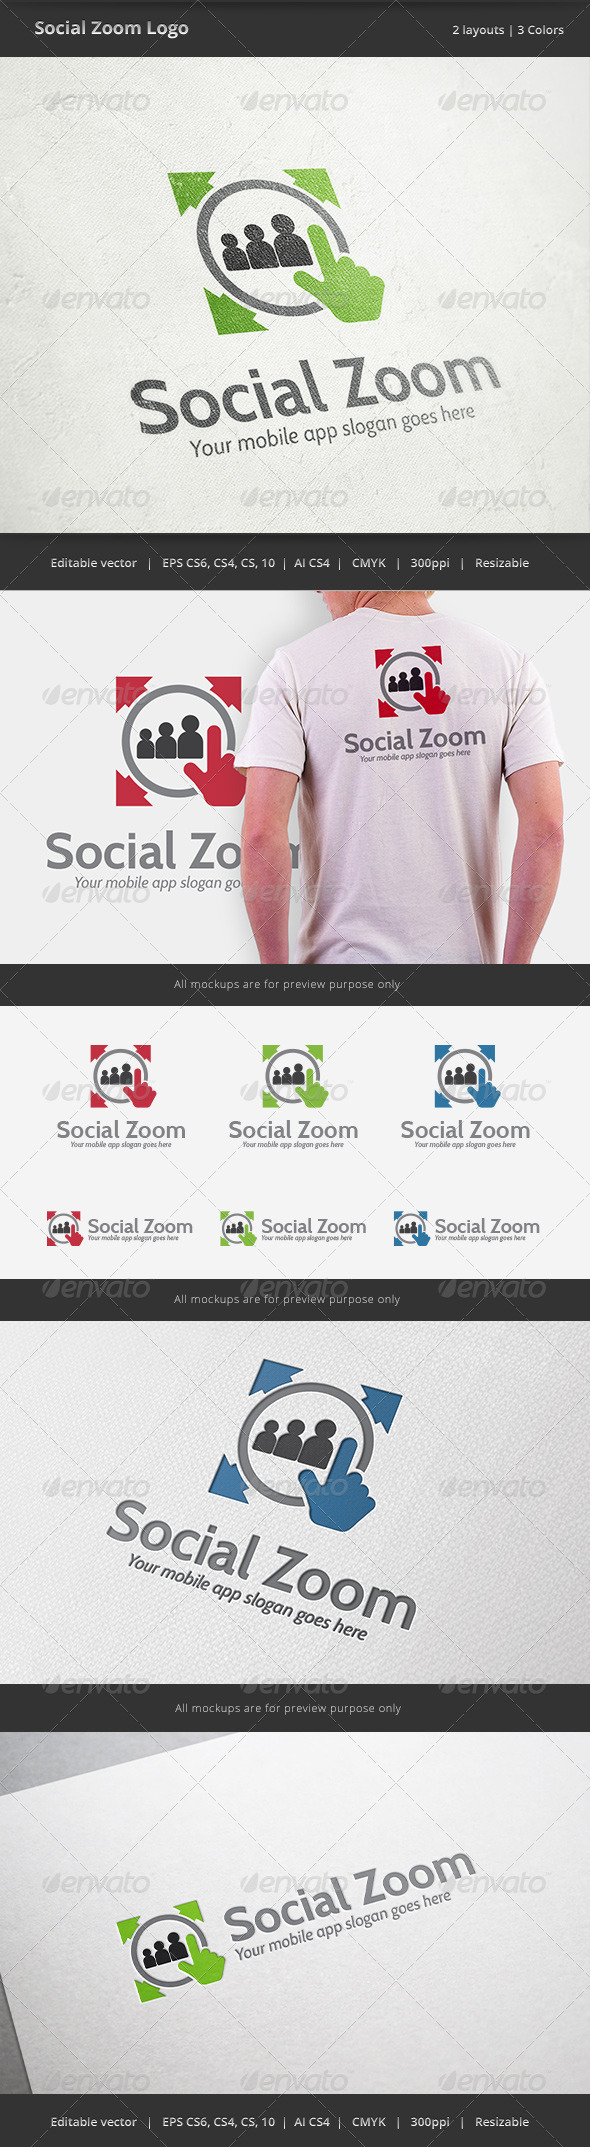 Soical Zoom Mobile Logo Mobile logo, Portfolio logo